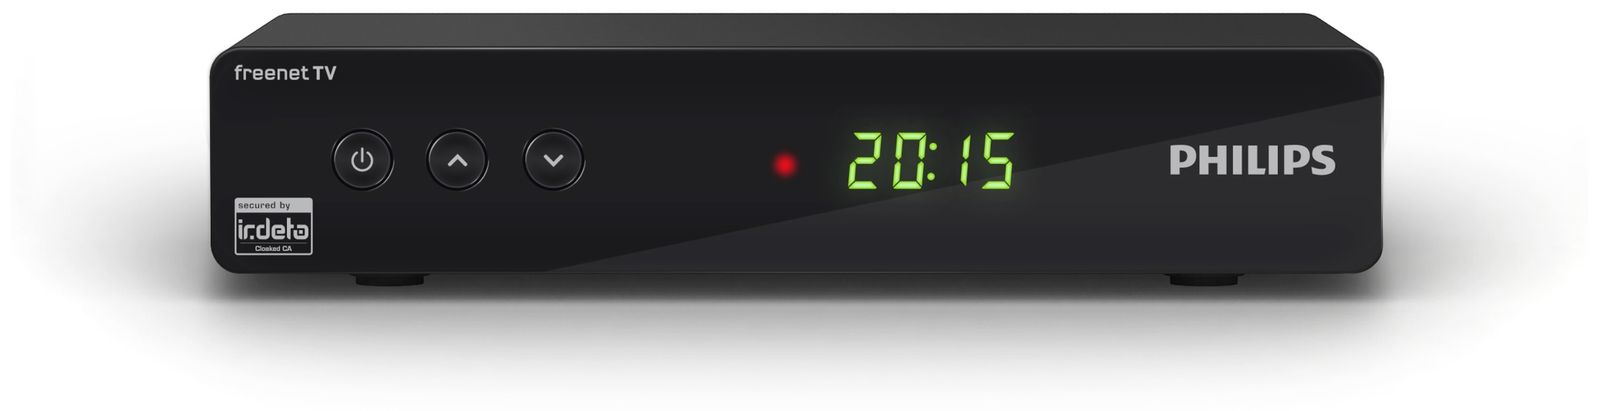 dvb t2 hdtv receiver philips dtr3442b freenet tv online kaufen. Black Bedroom Furniture Sets. Home Design Ideas